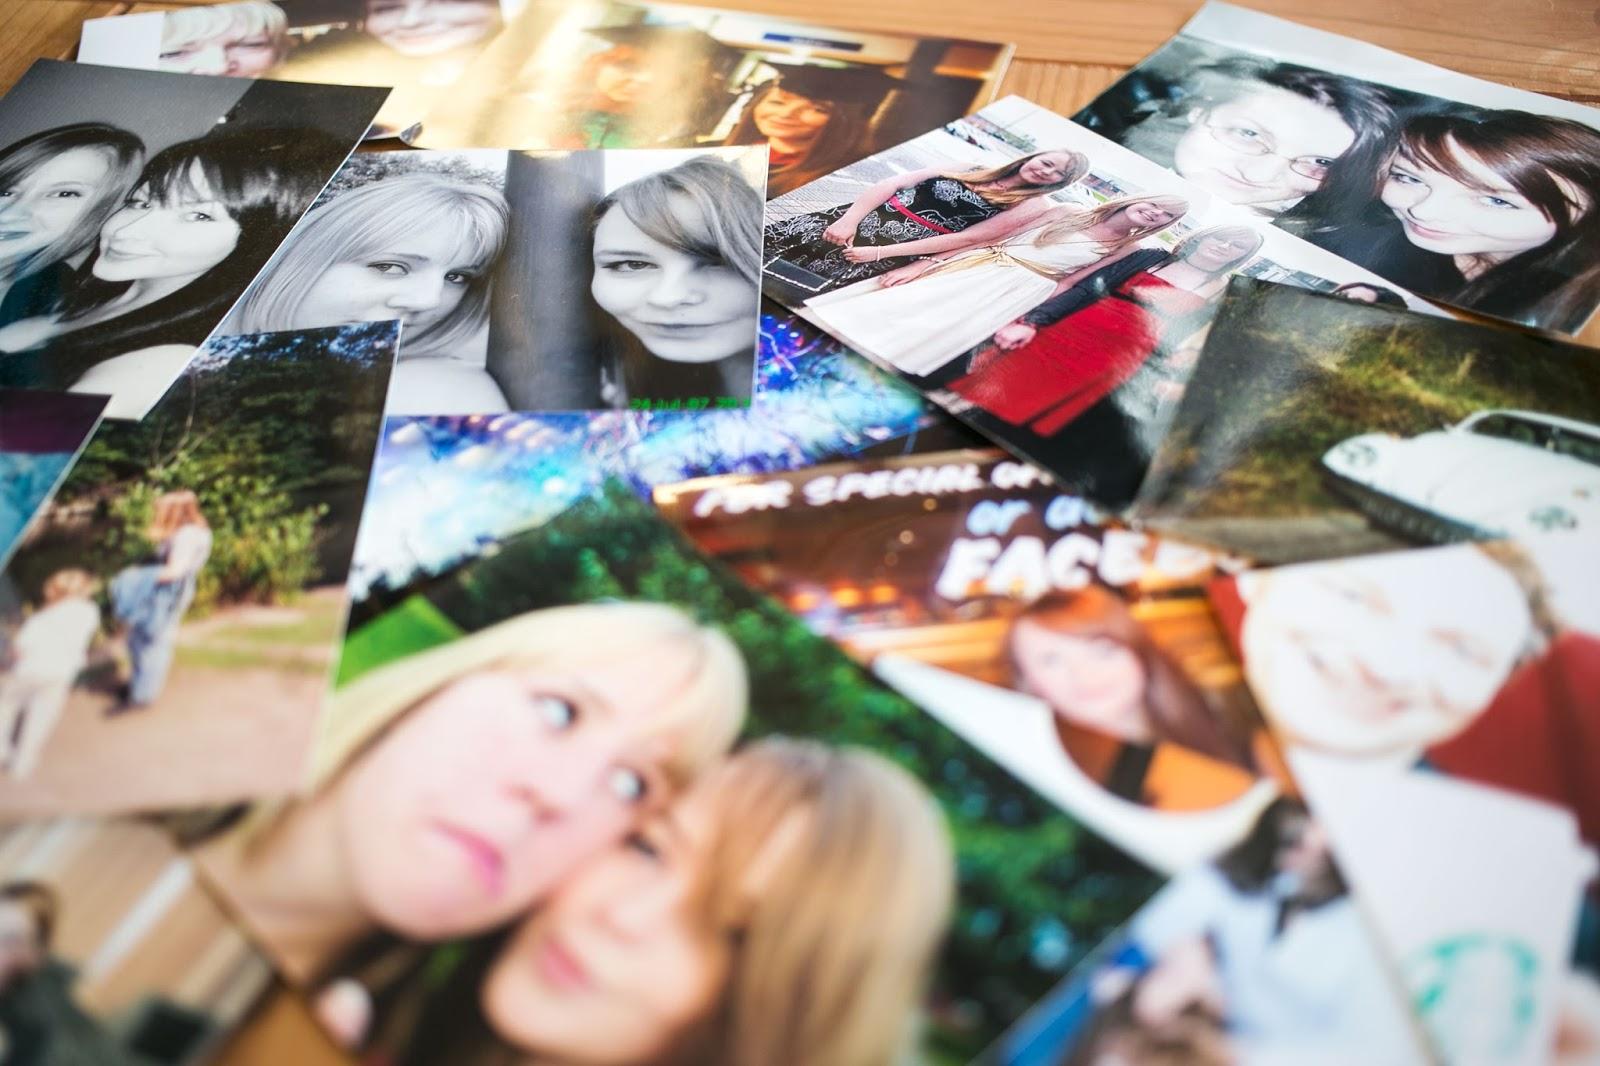 Photos, Collage, Derbyshire Blogs, East Midlands Bloggers, Katie Writes Blog, Katie Writes,